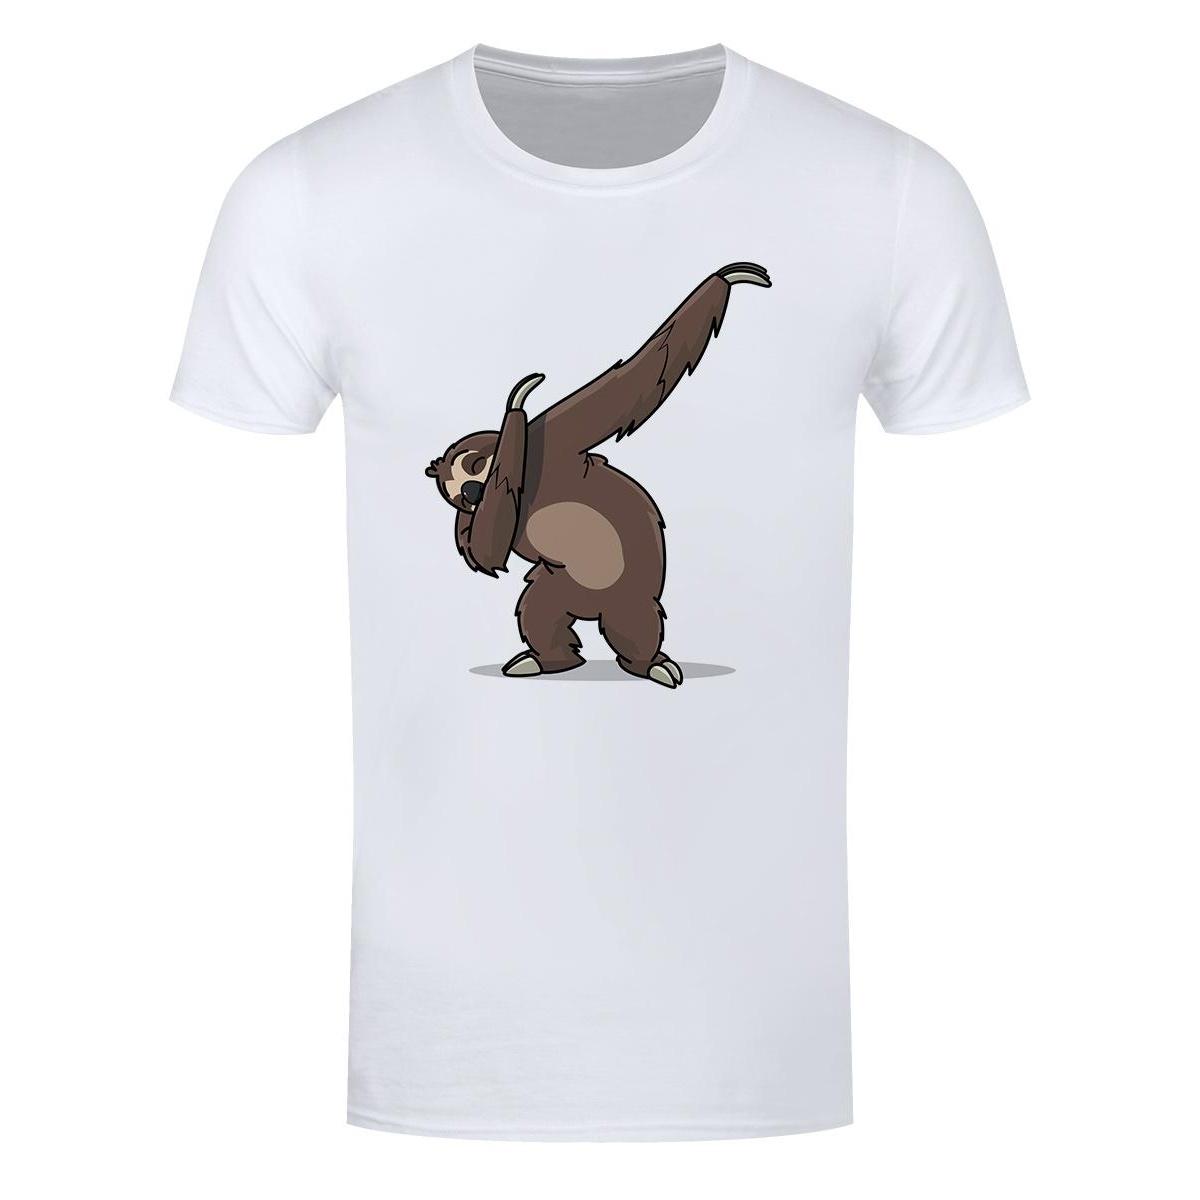 Grindstore Mens Sloth Dab T-Shirt (XXL) (White/Brown)